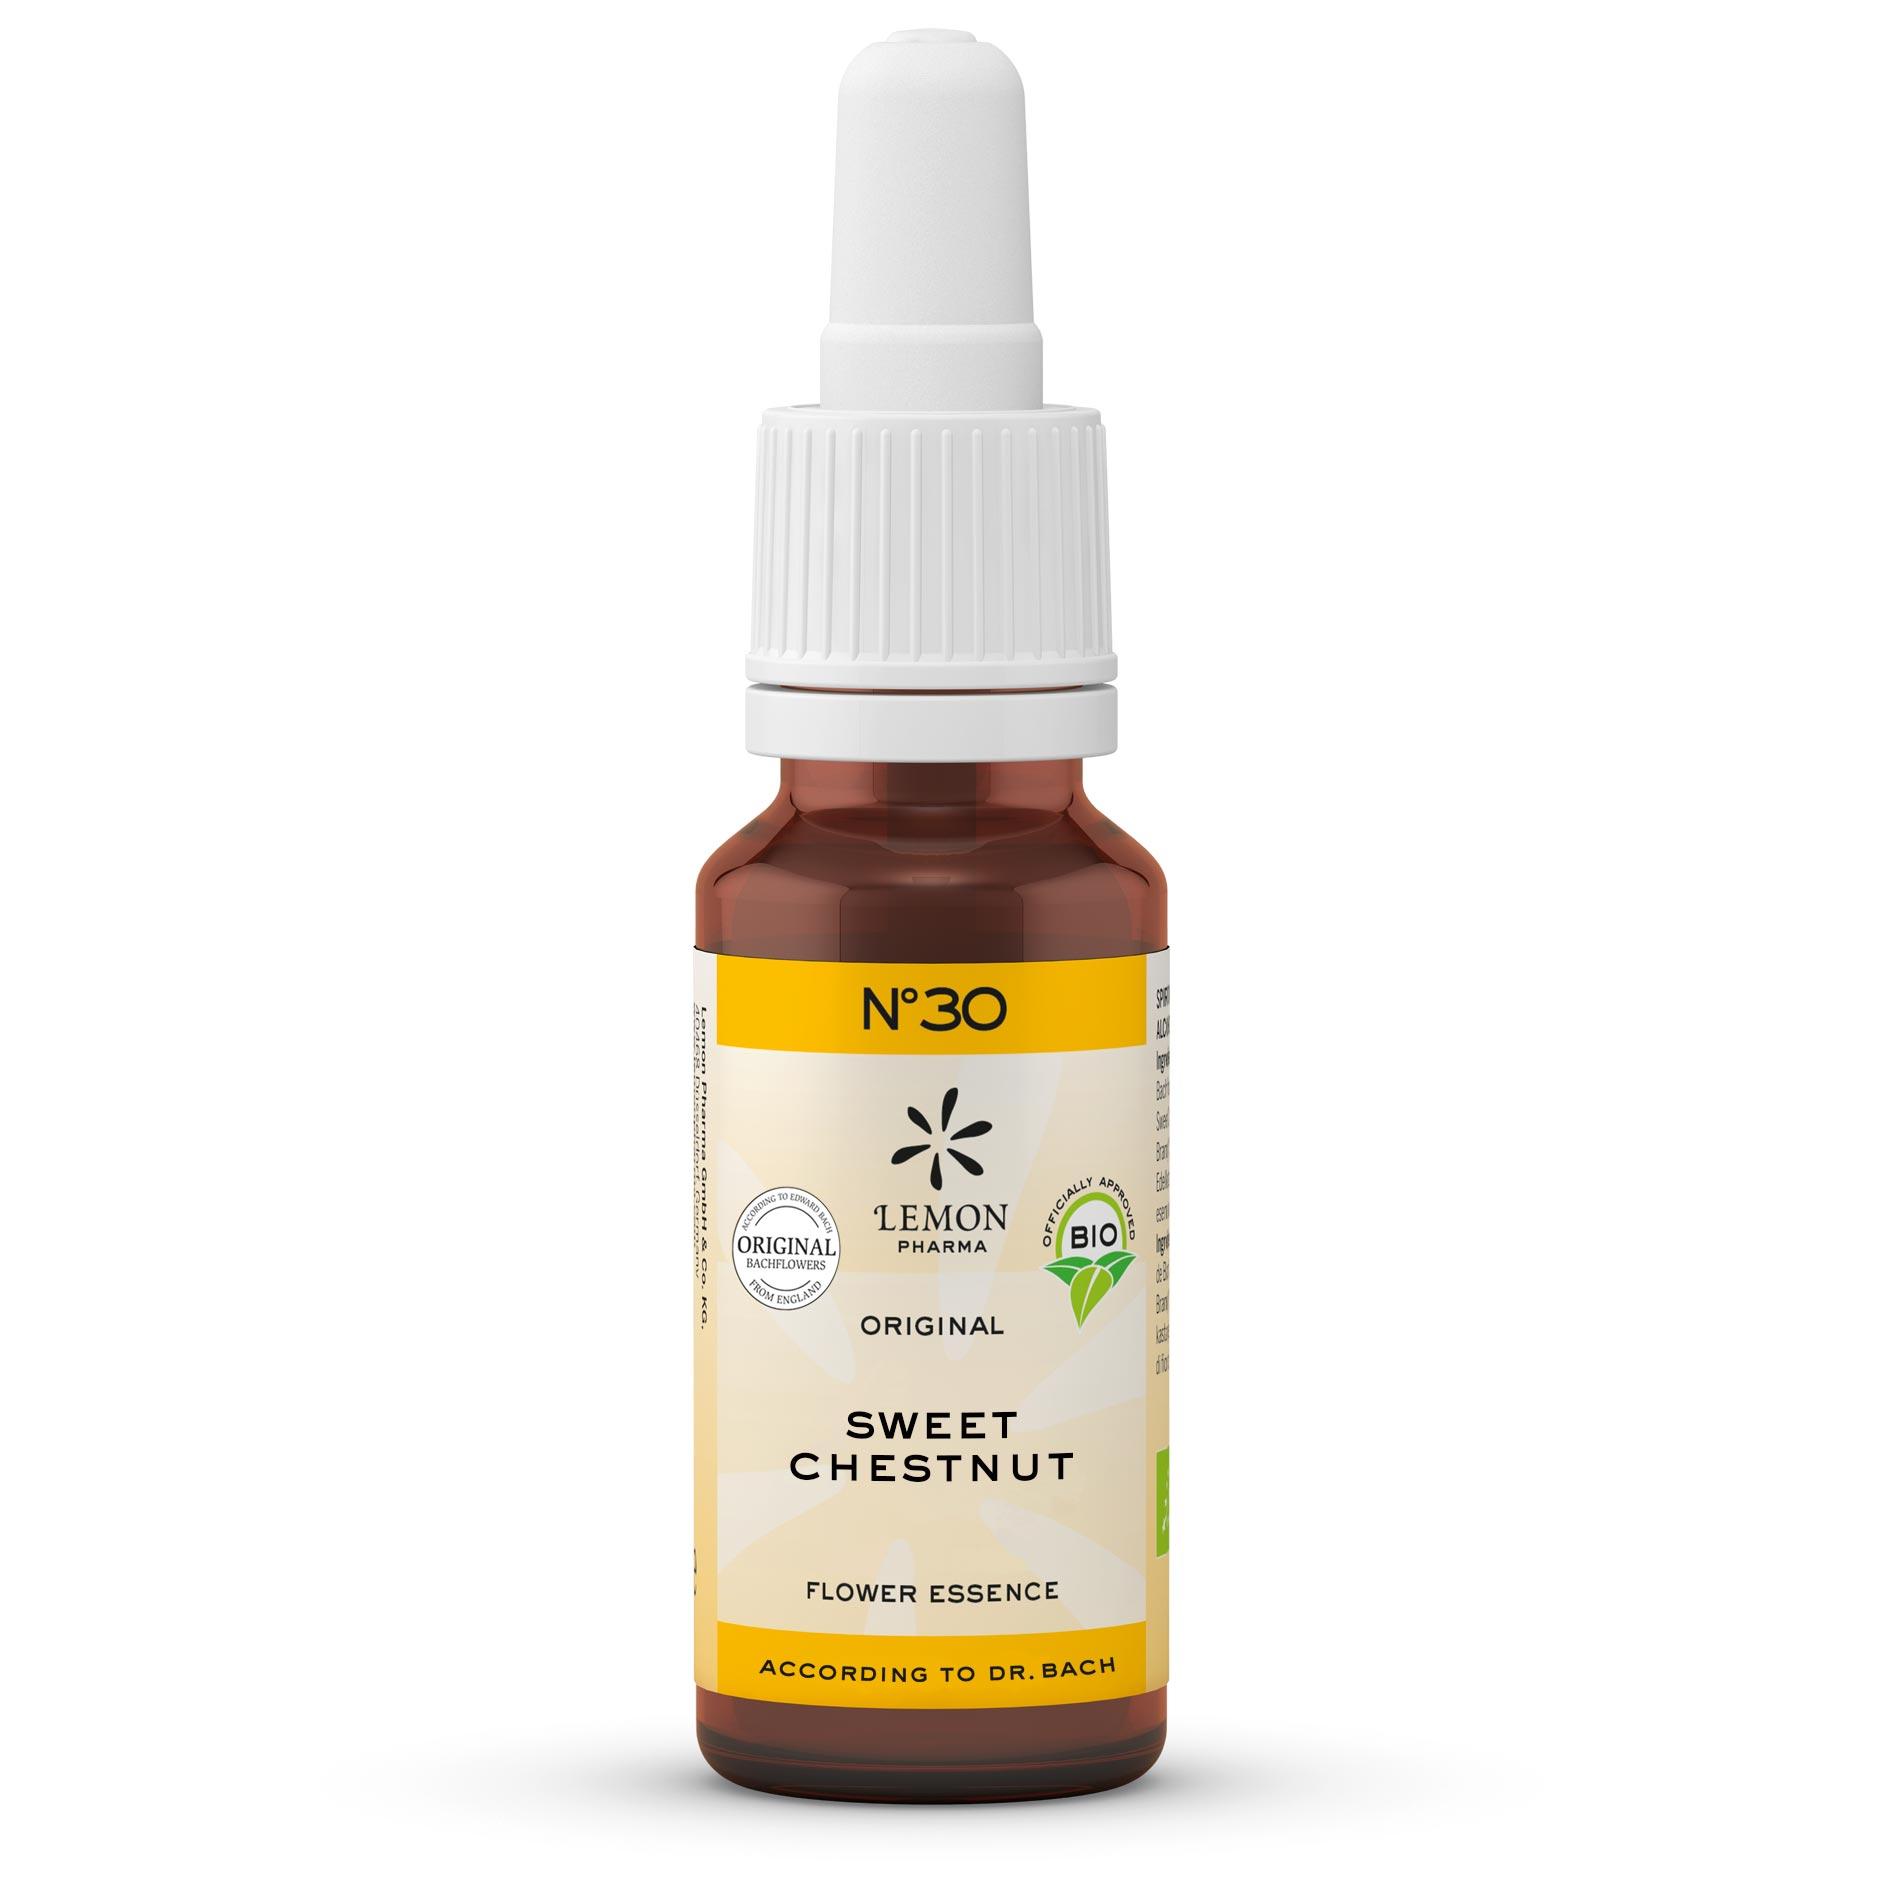 Lemon Pharma Original Bachblüten Tropfen Nr 30 Sweet Chestnut Edelkastanie Belebung